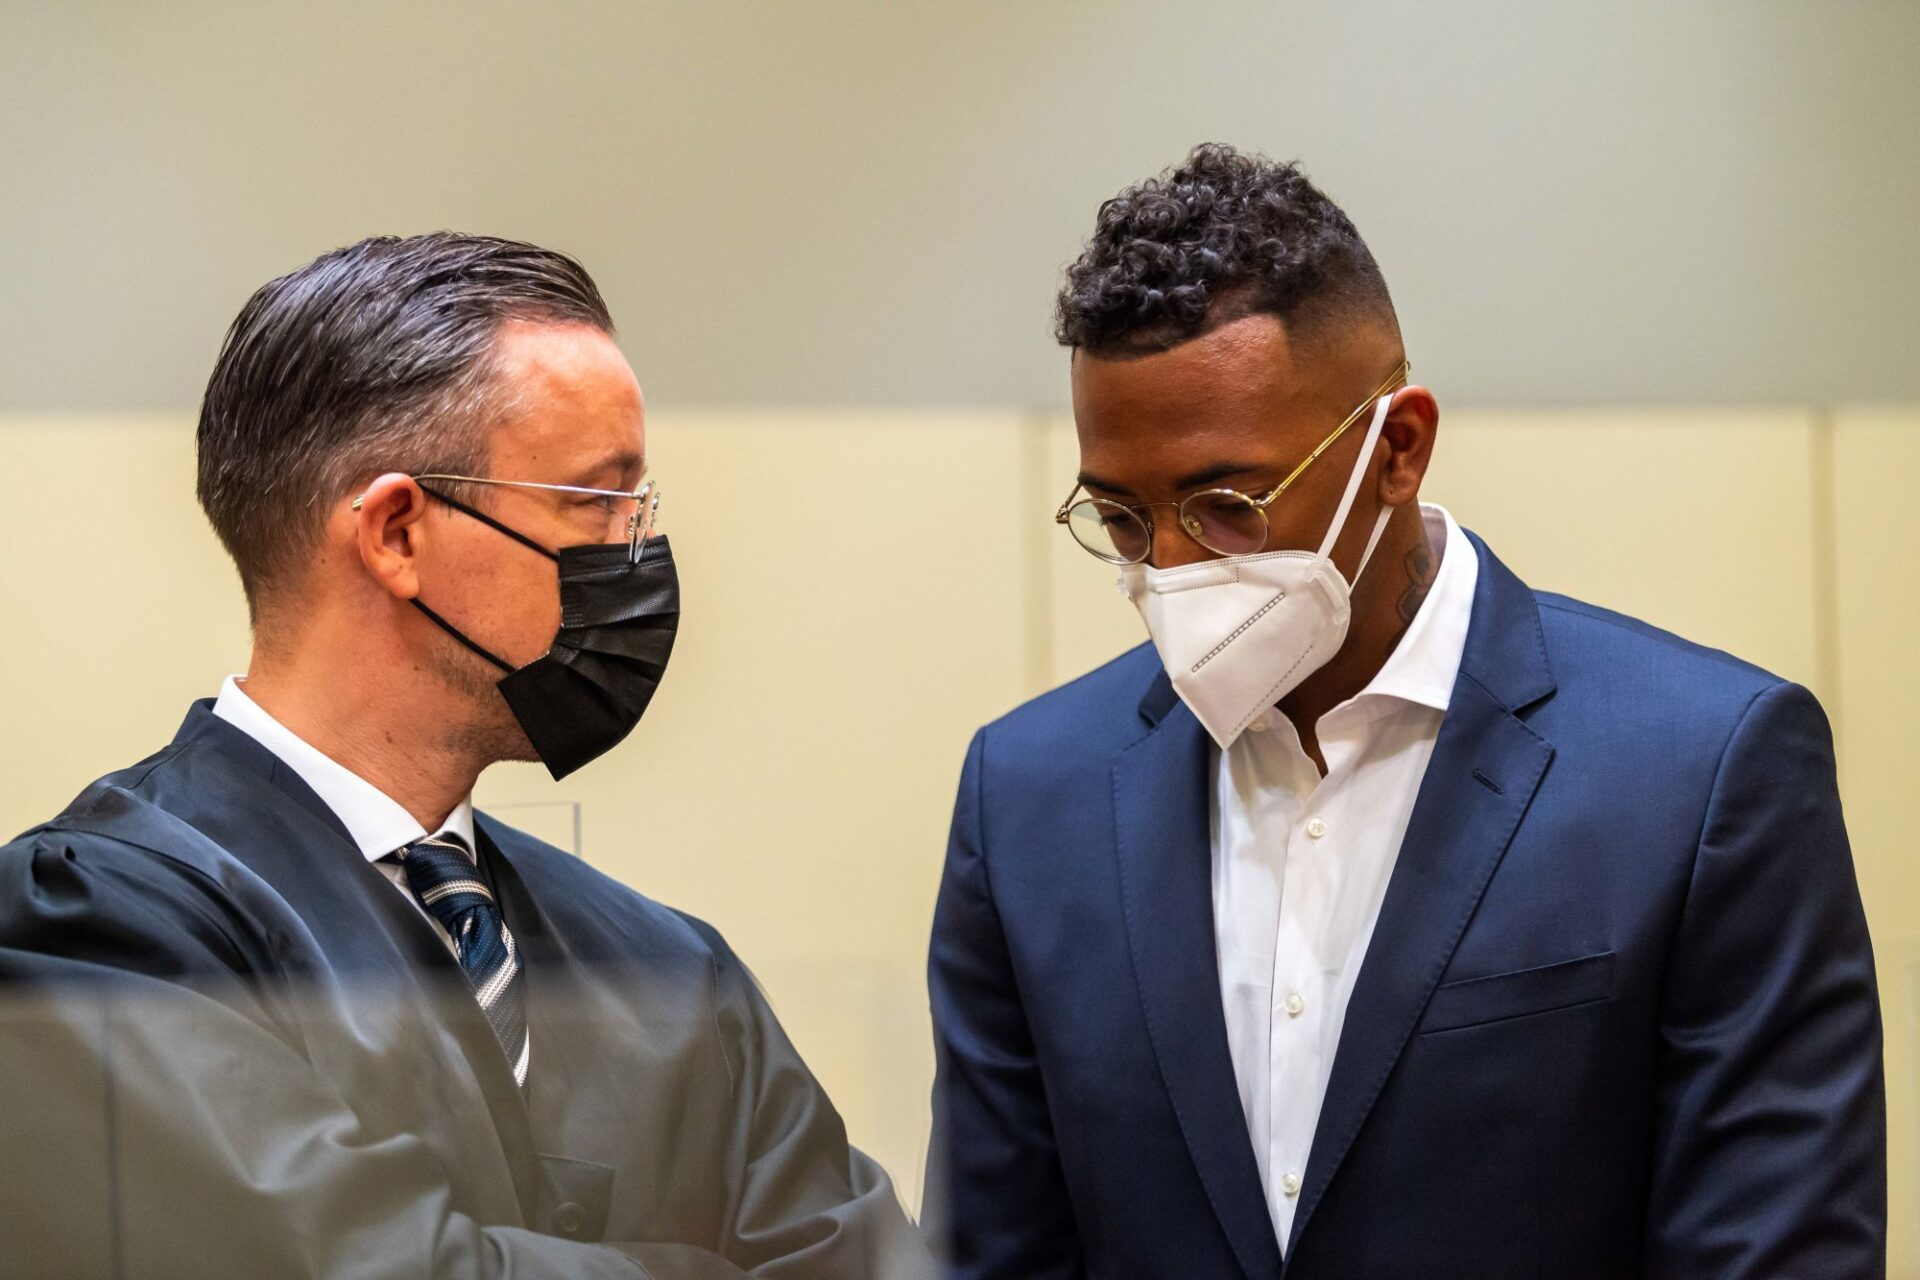 Jérôme Boateng lors de son procès. Icon Sport